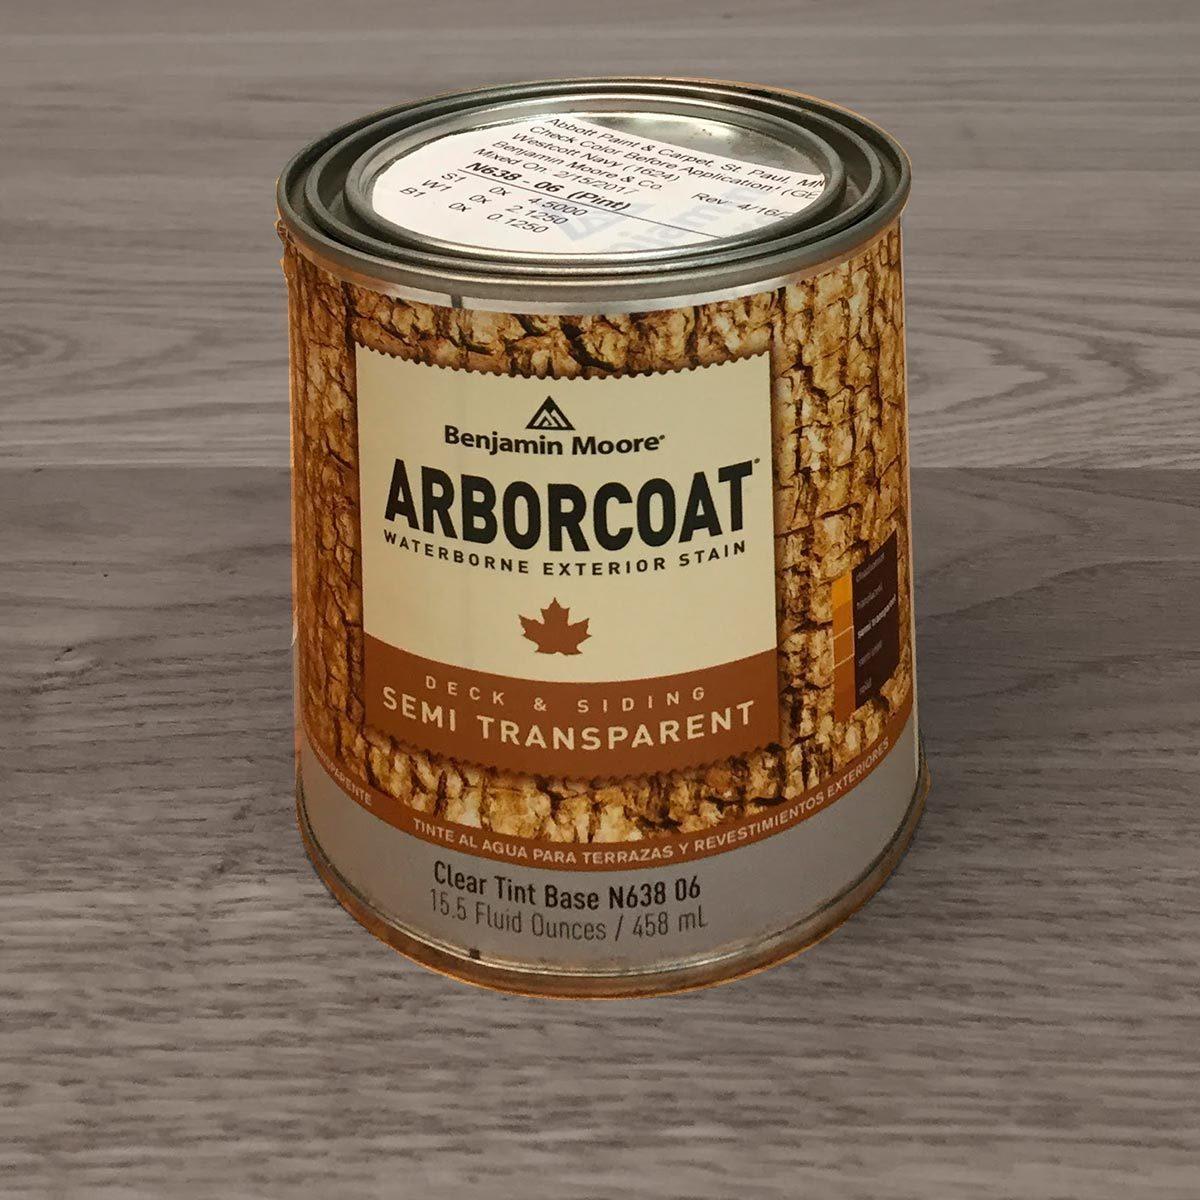 Benjamin Moore Arborcoat Semi-Transparent Stain